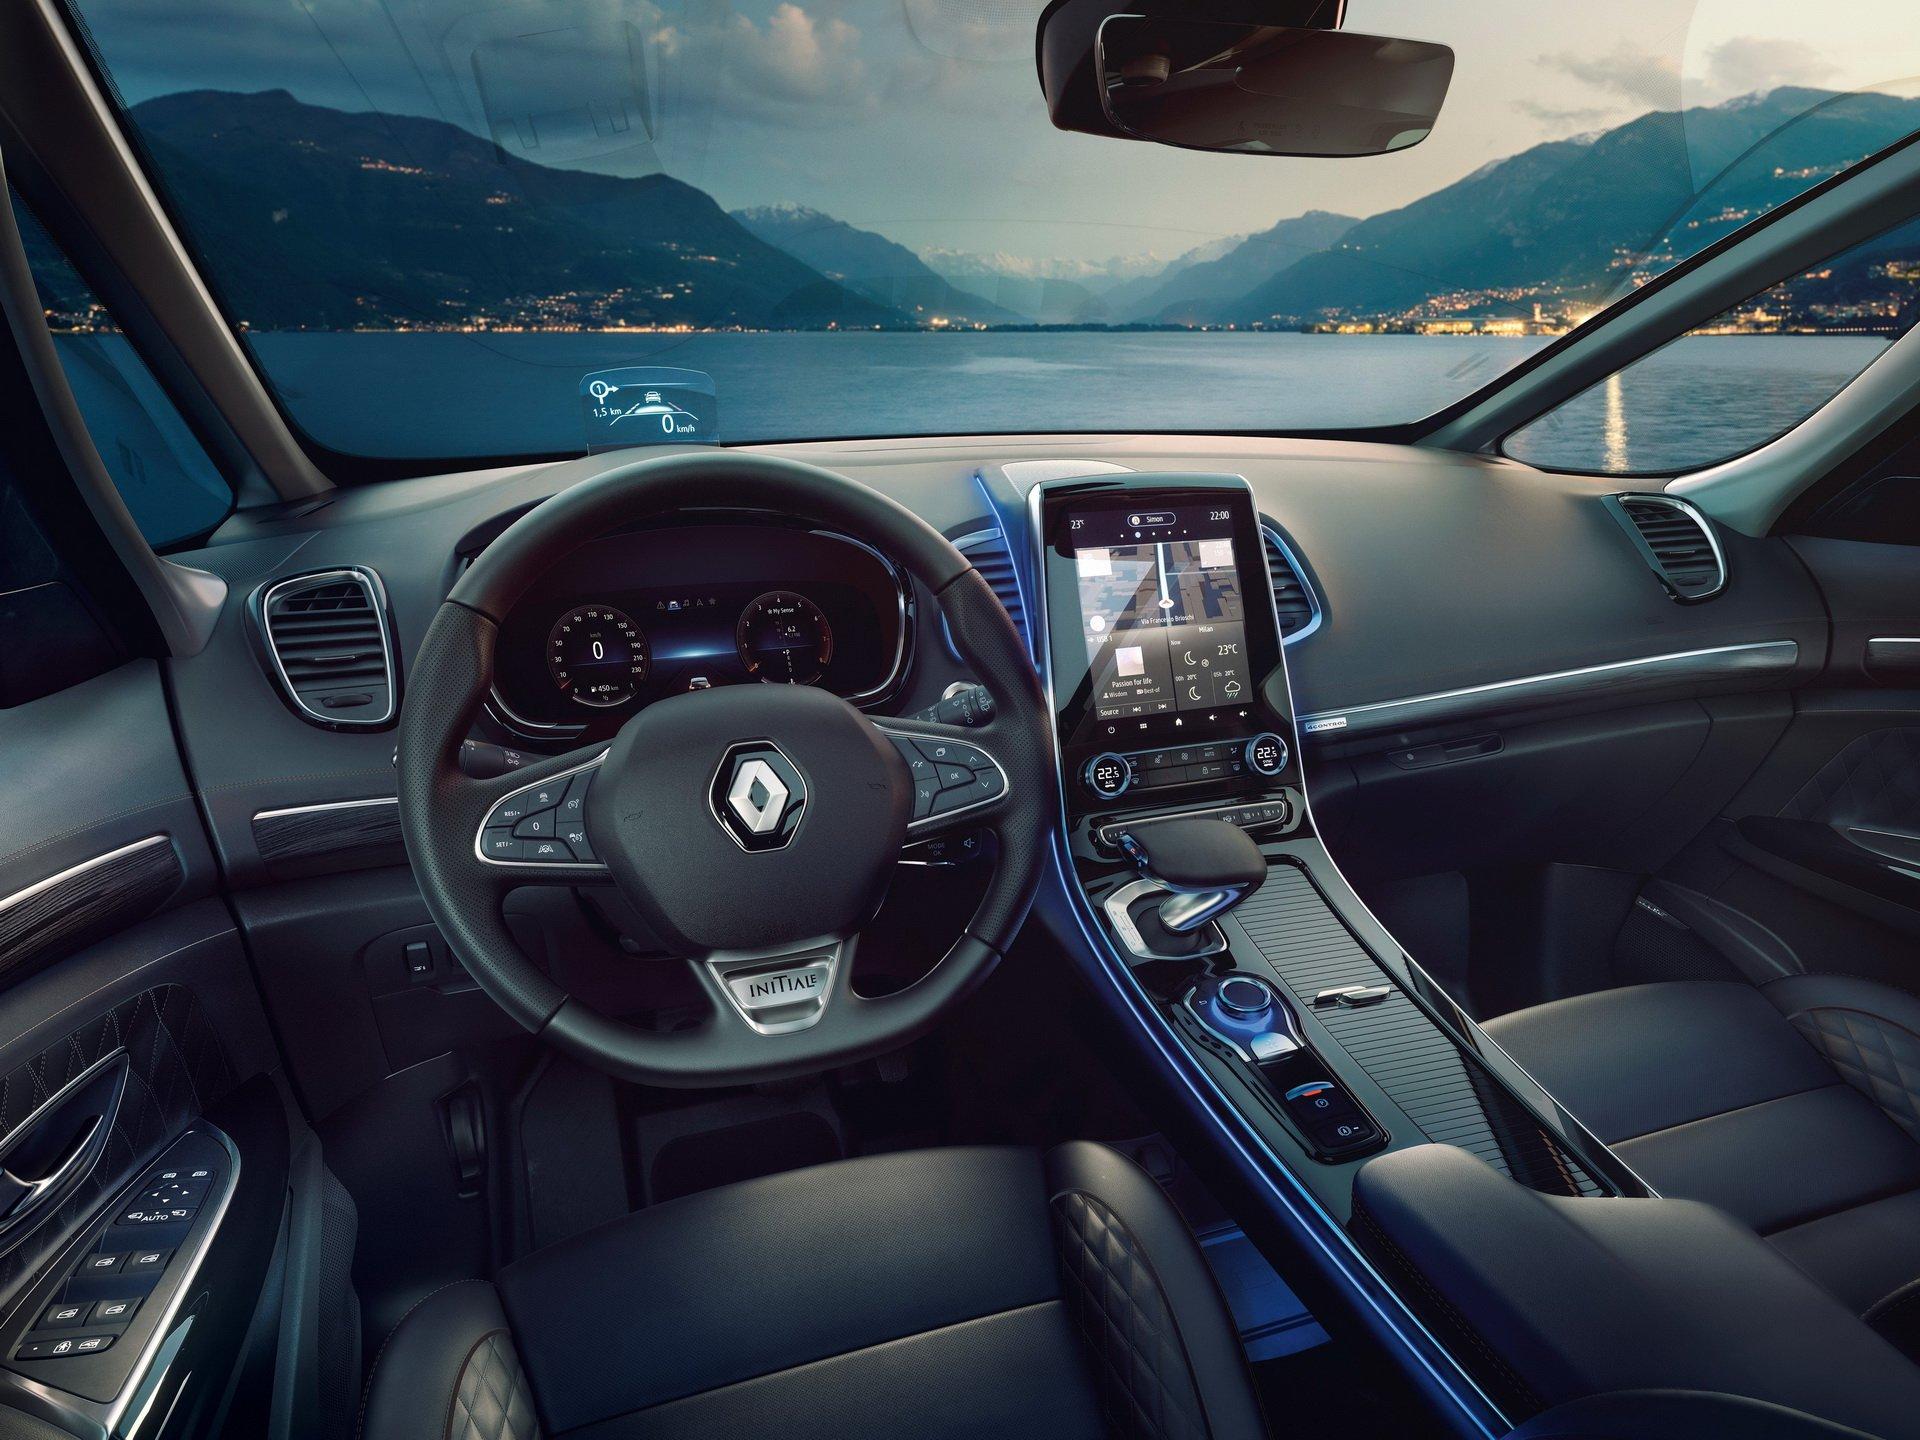 Renault Espace 2020 (15)